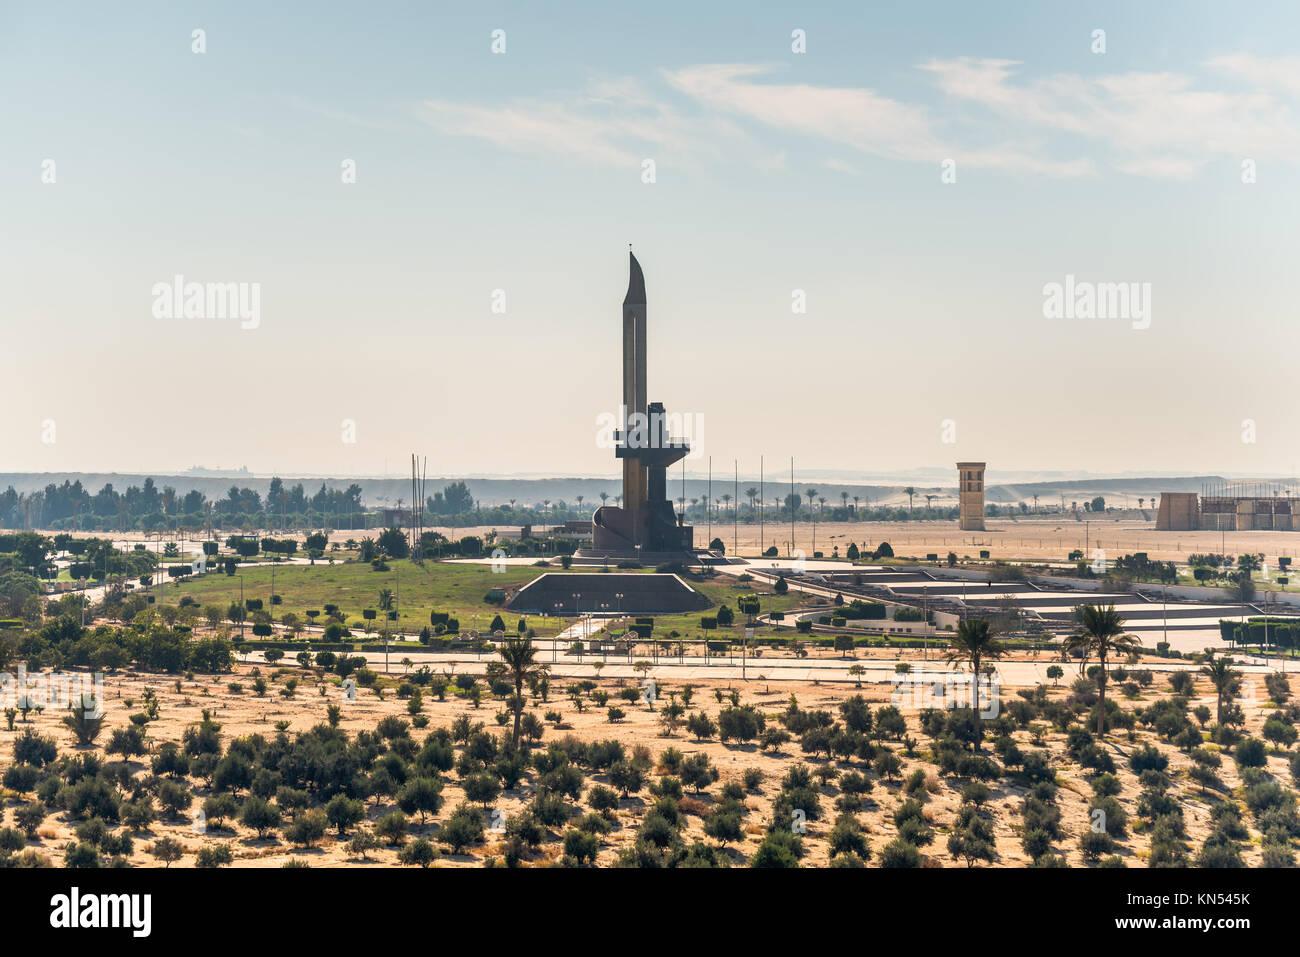 Ismailia, Egypt - November 5, 2017: AK-47 muzzle and bayonet, on the eastern shore of the Suez Canal, near Ismailia, - Stock Image